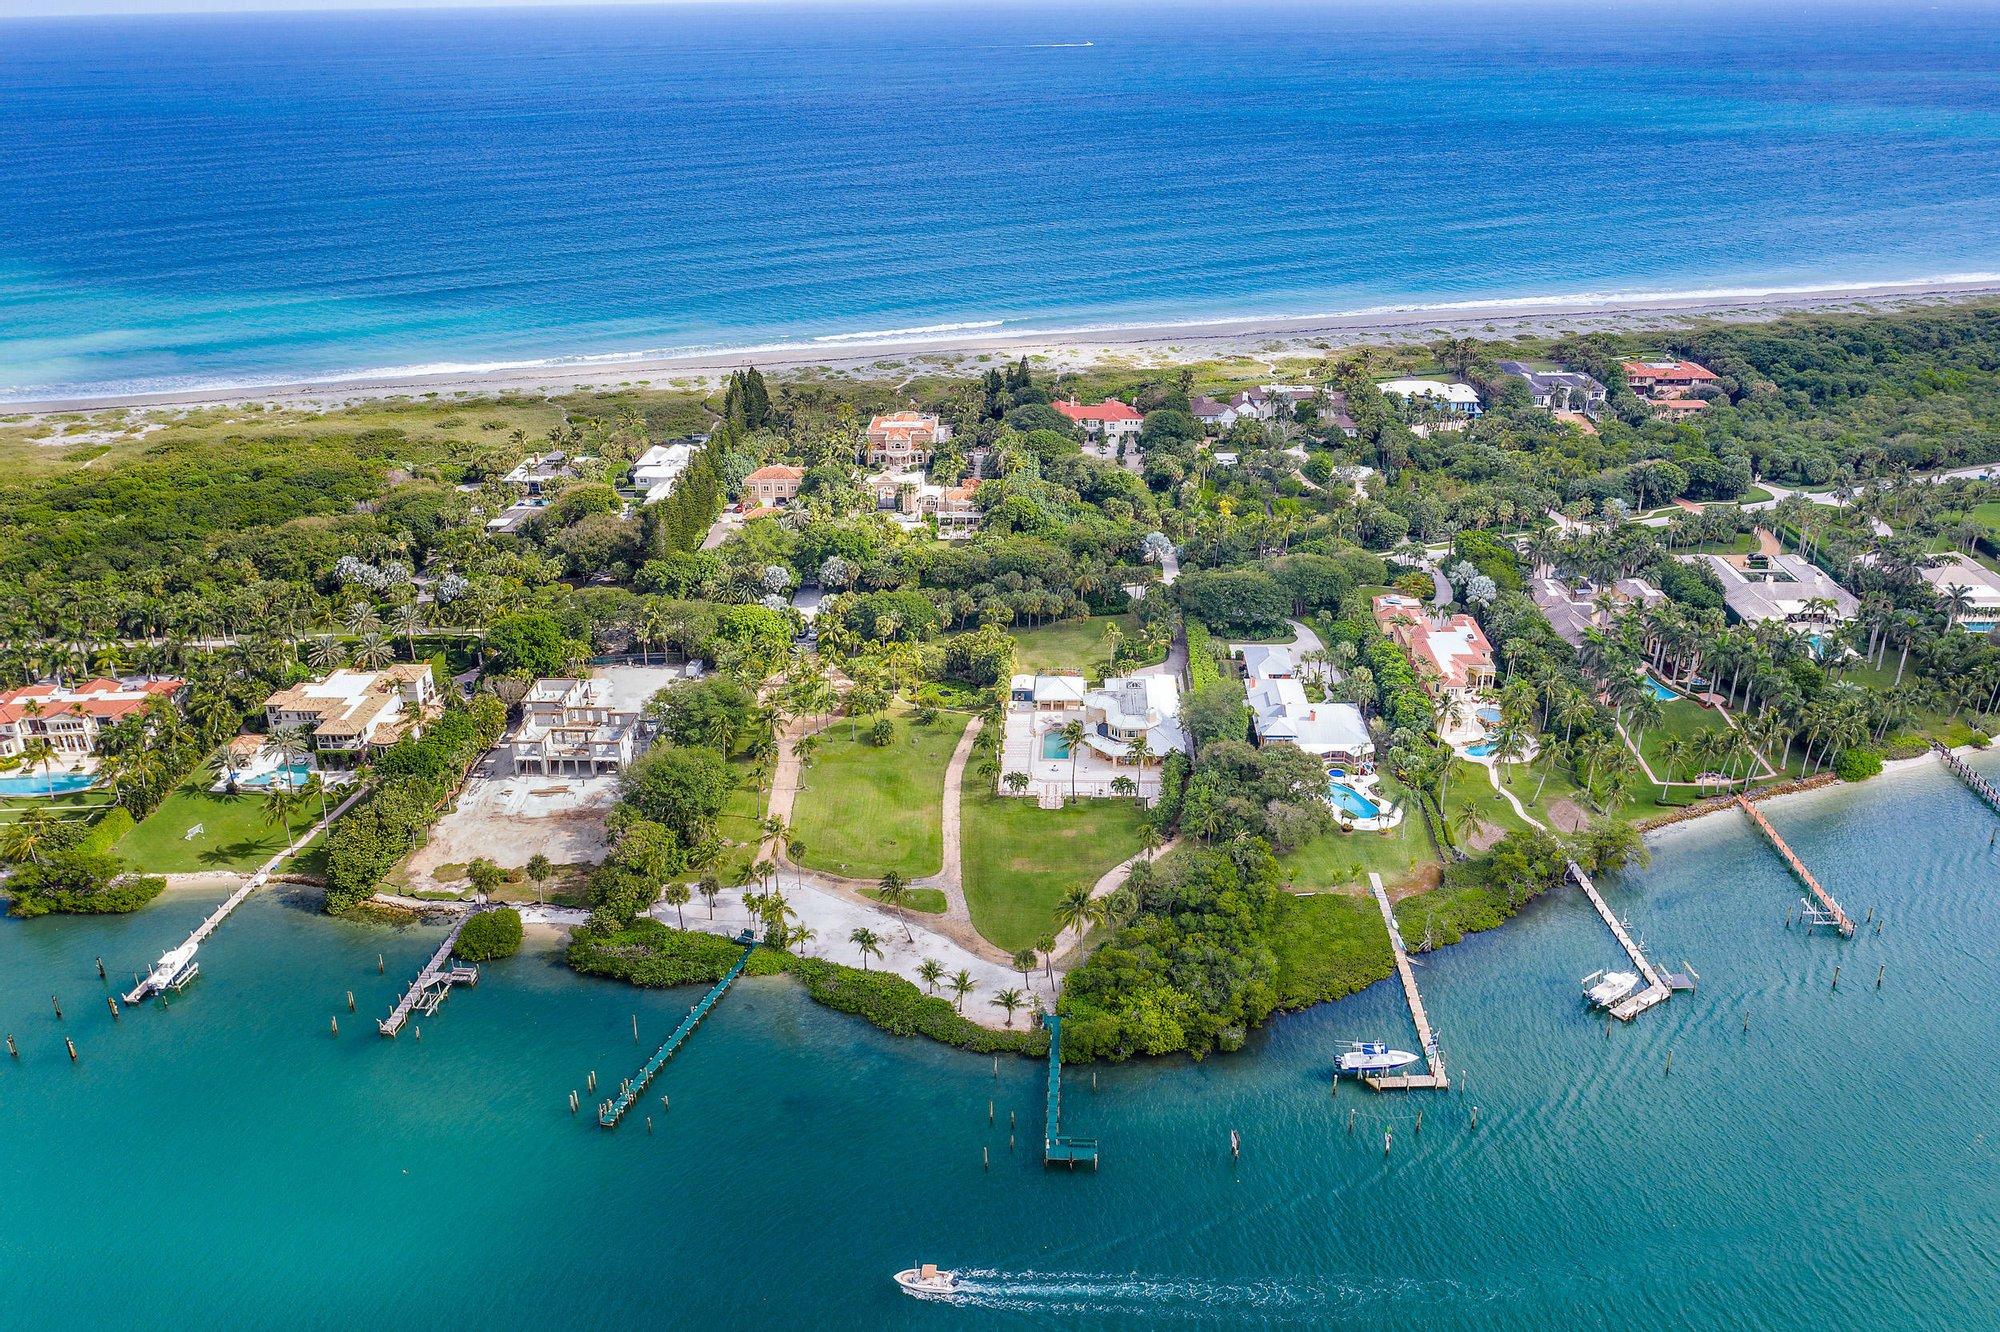 House in Hobe Sound, Florida, United States 1